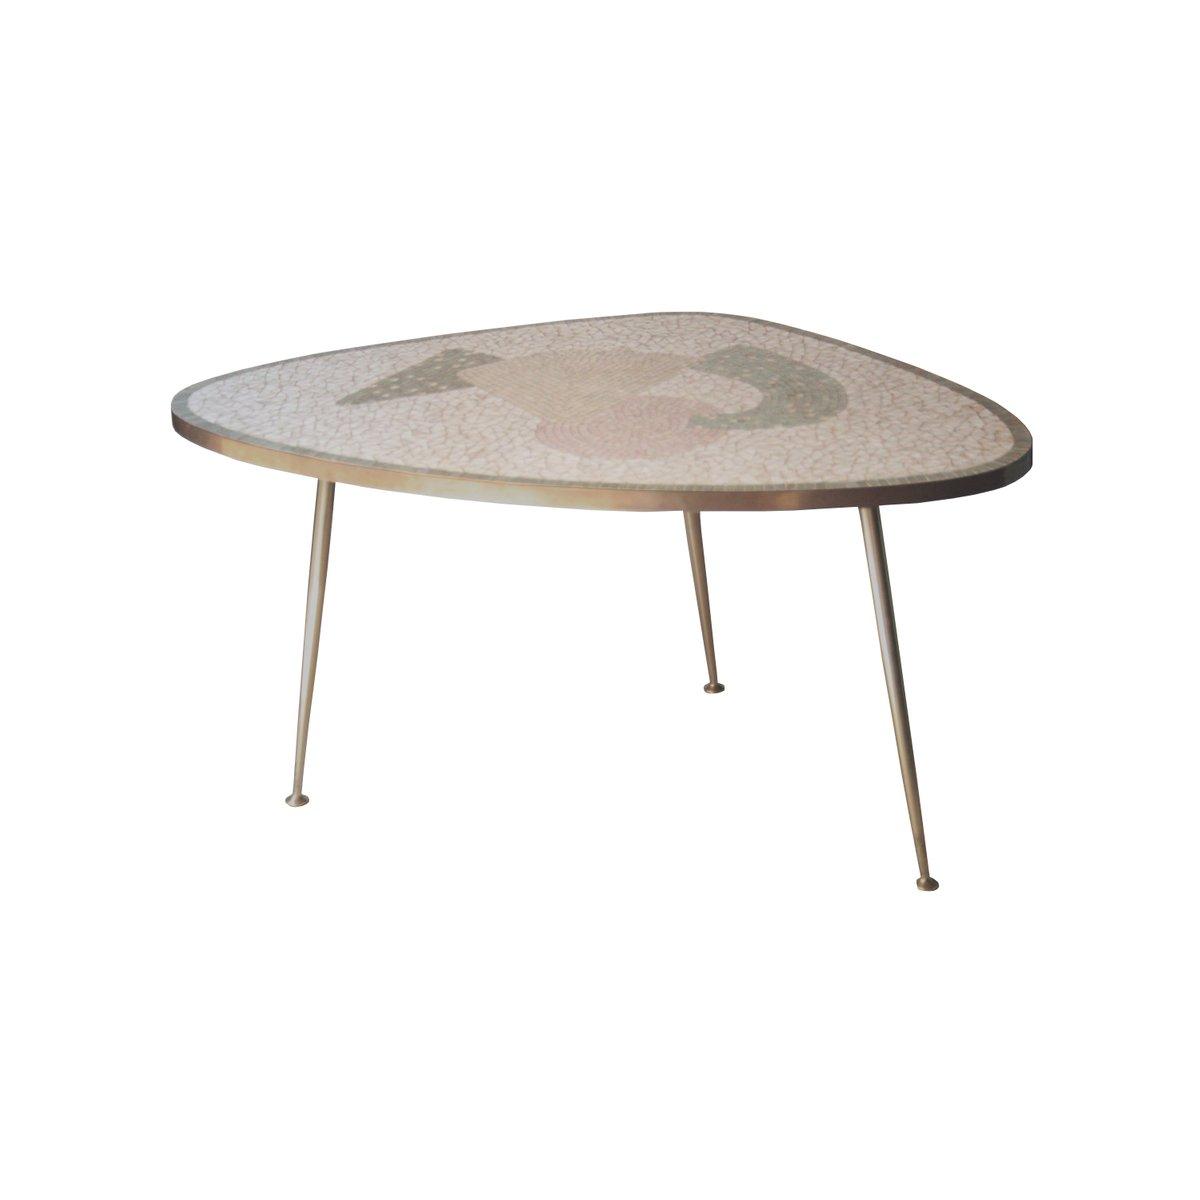 swivel chair mustard yellow small pub table and chairs italienischer tisch mit tessera platte 1960er bei pamono